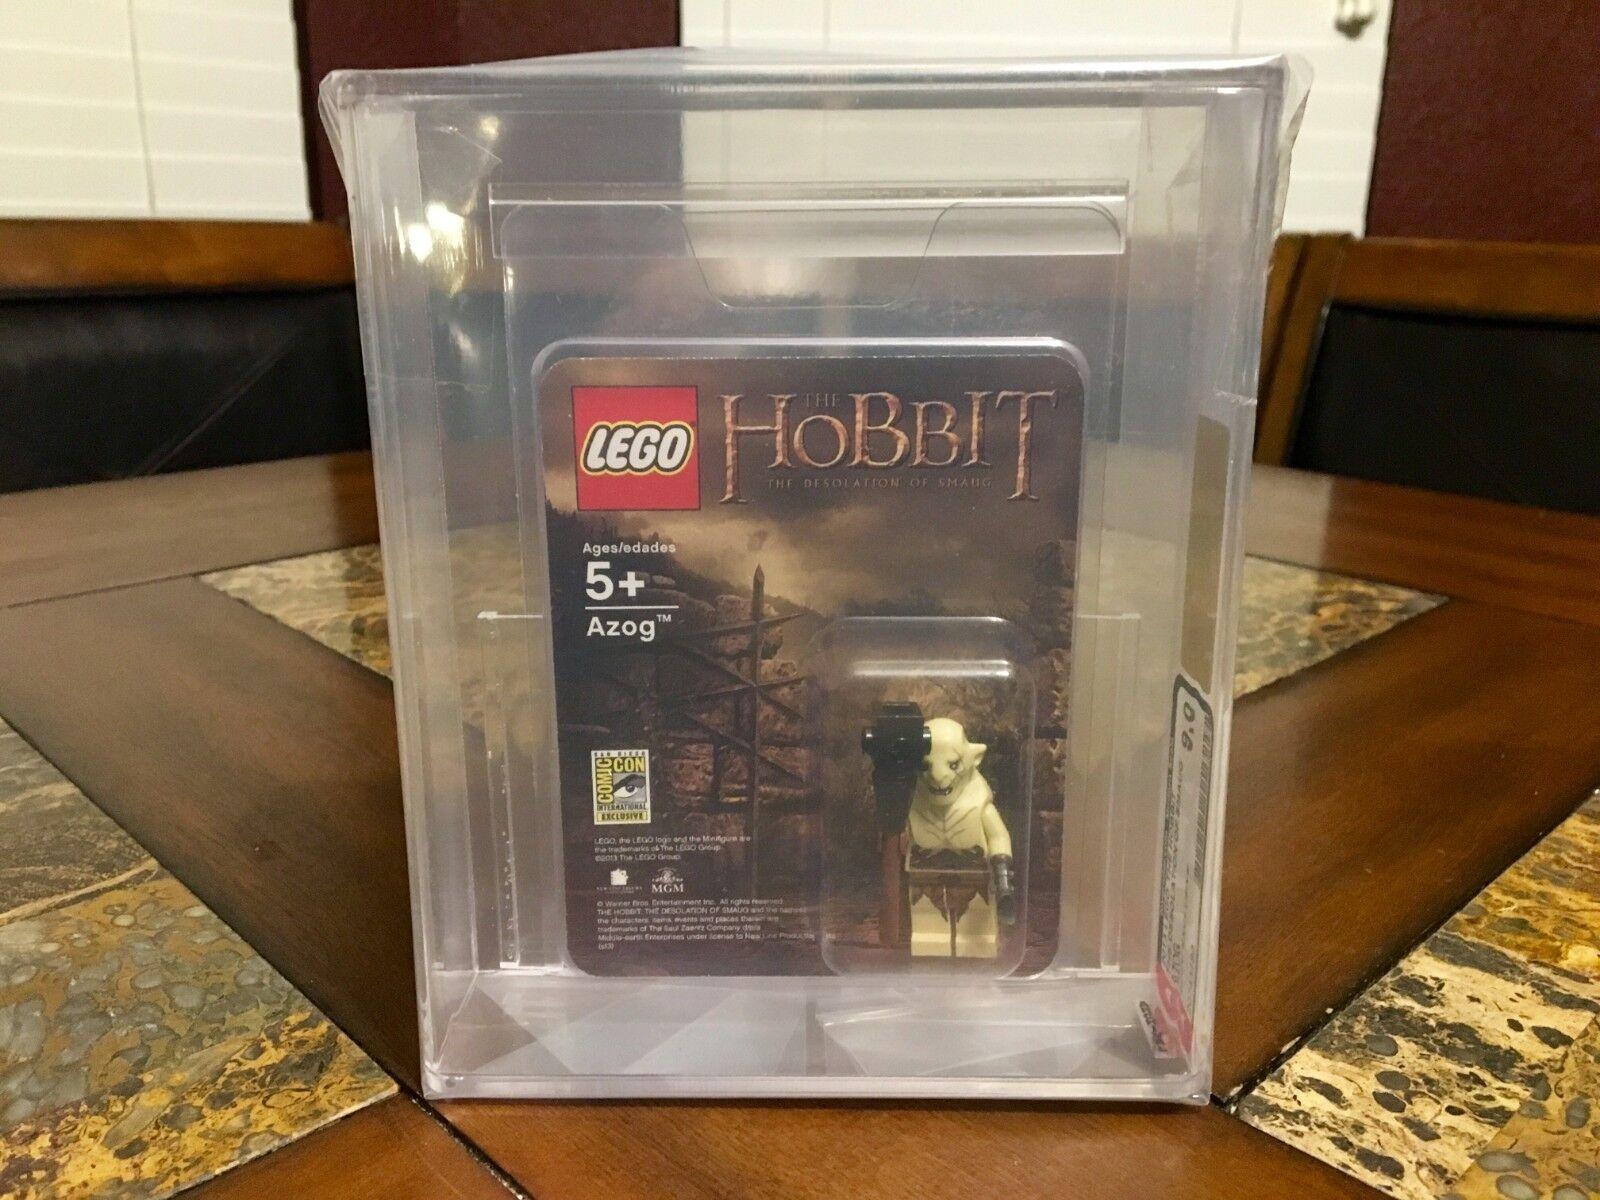 LEGO  HOBBIT AZOG MINI FIGURE 2013 SDCC SAN DIEGO COMIC CON AFA 9.0  commandez maintenant profitez de gros rabais